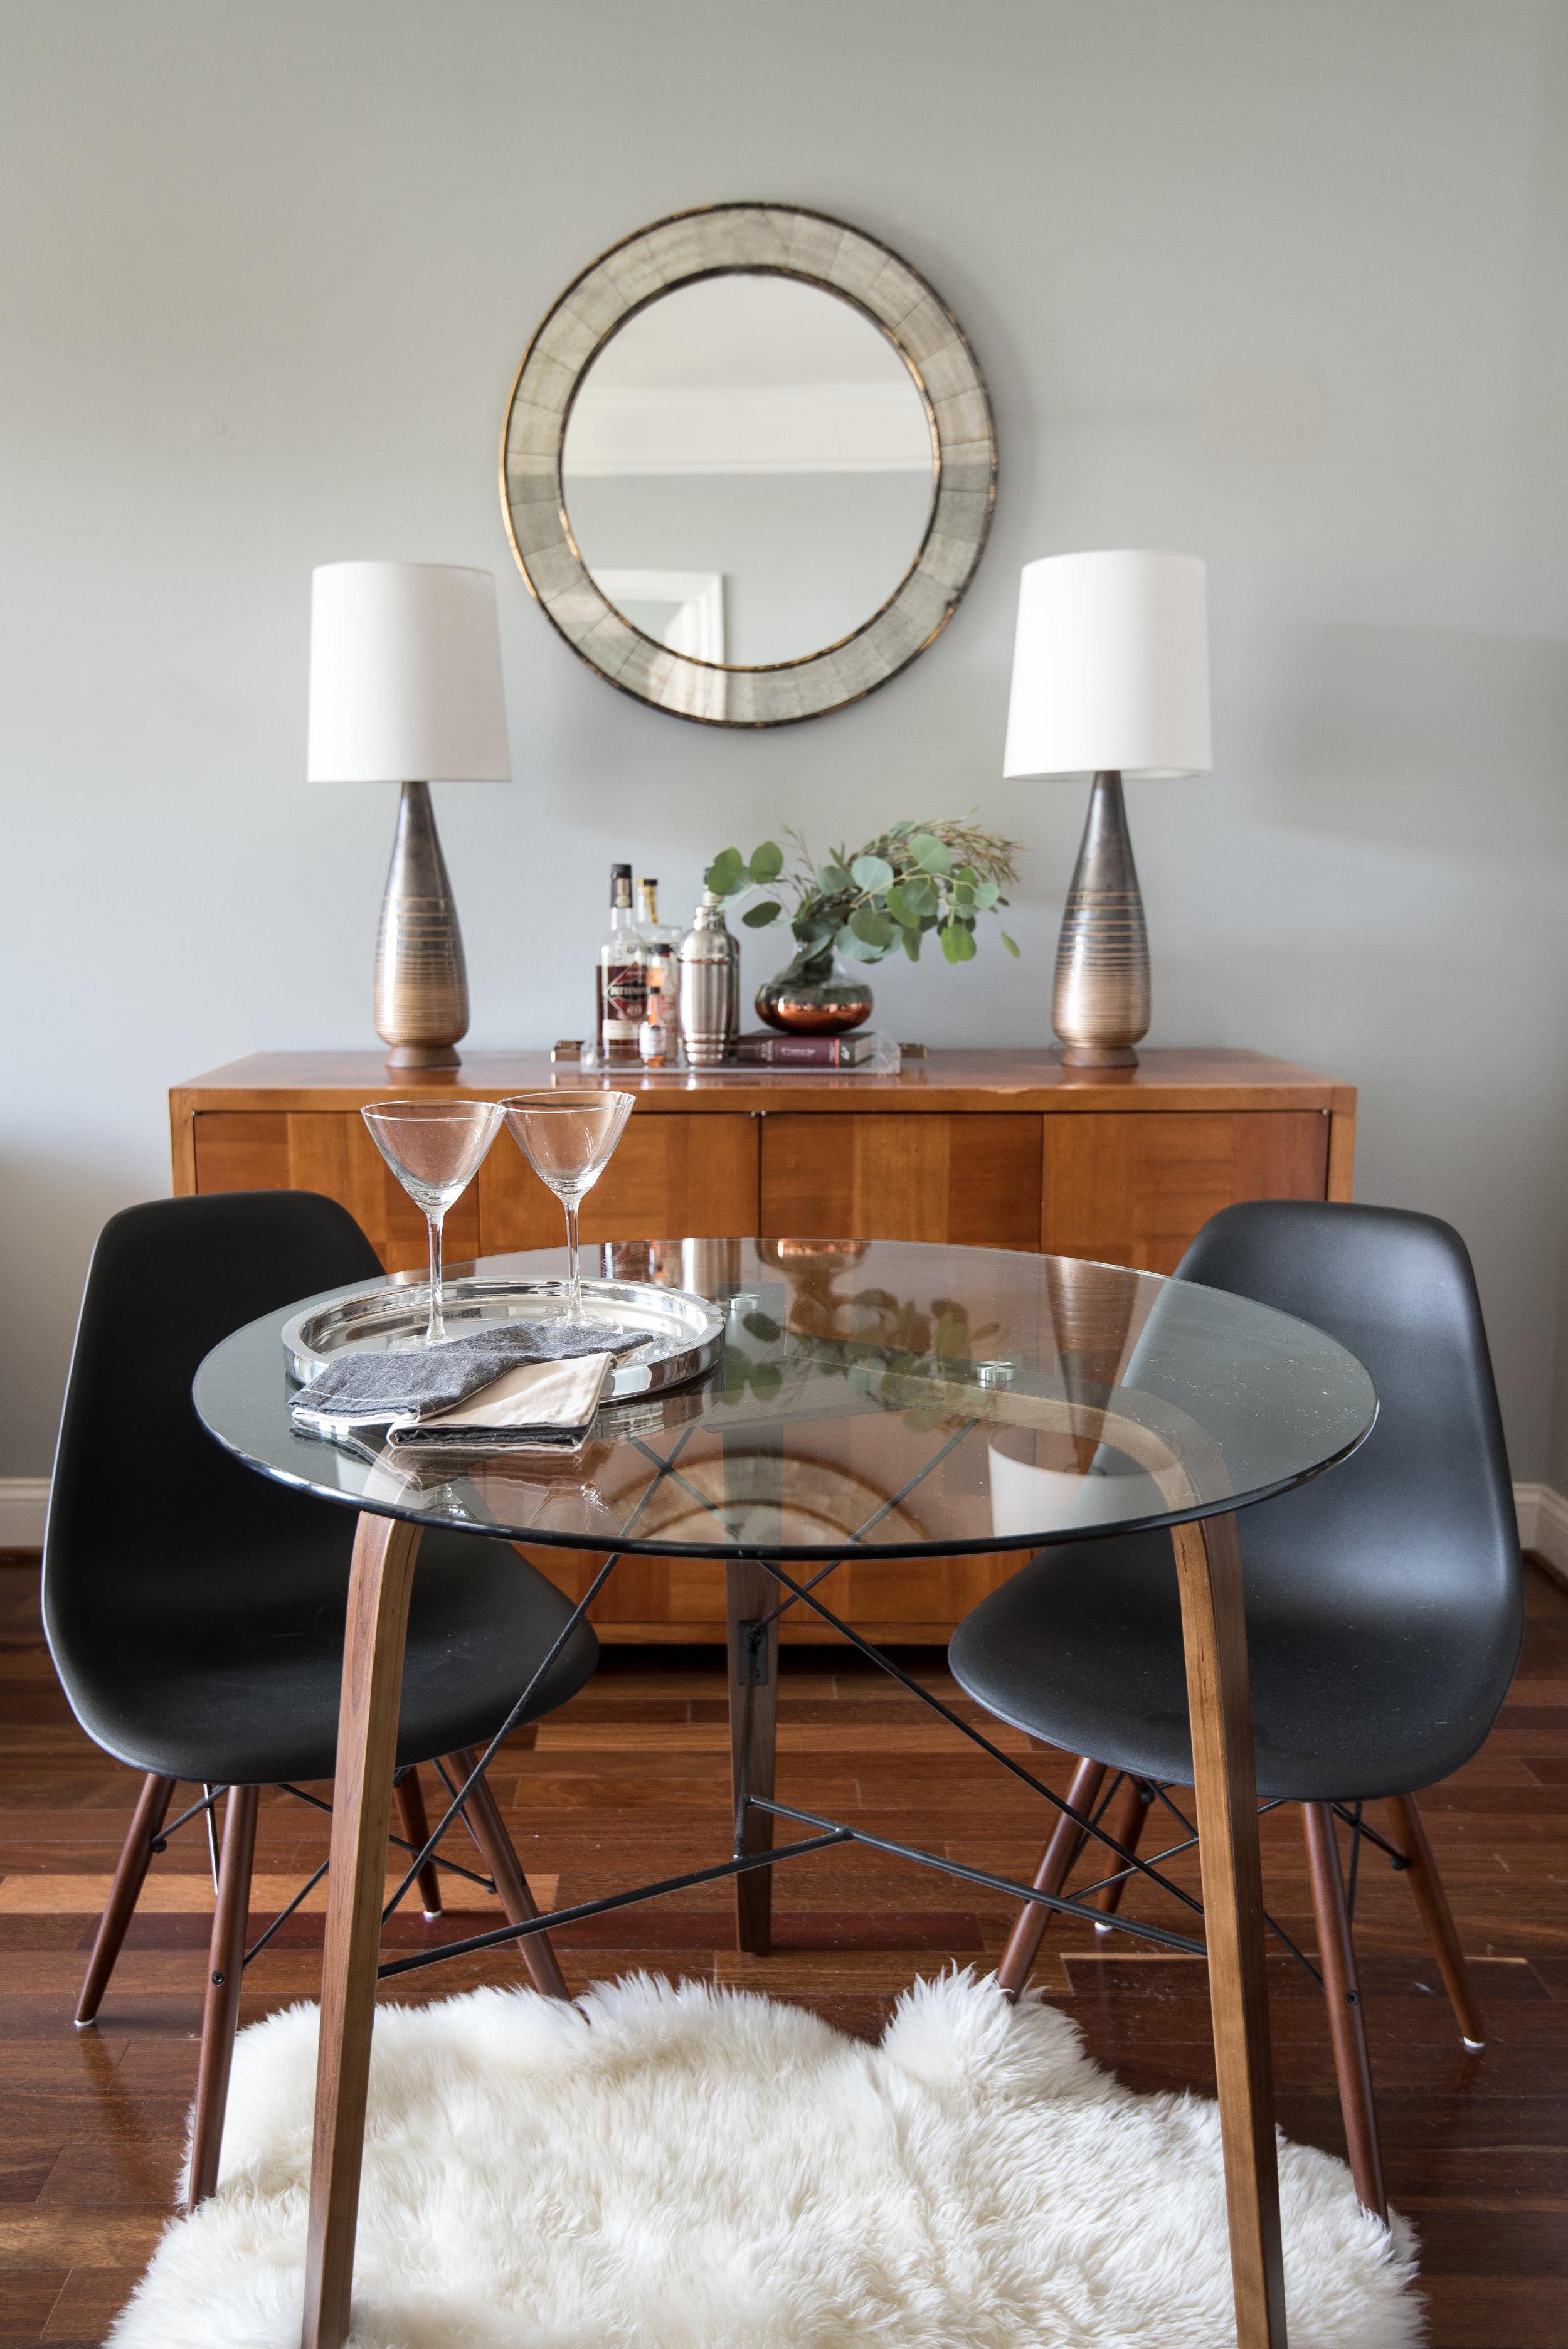 mariella-cruzado-splendor-styling-small-dining-room